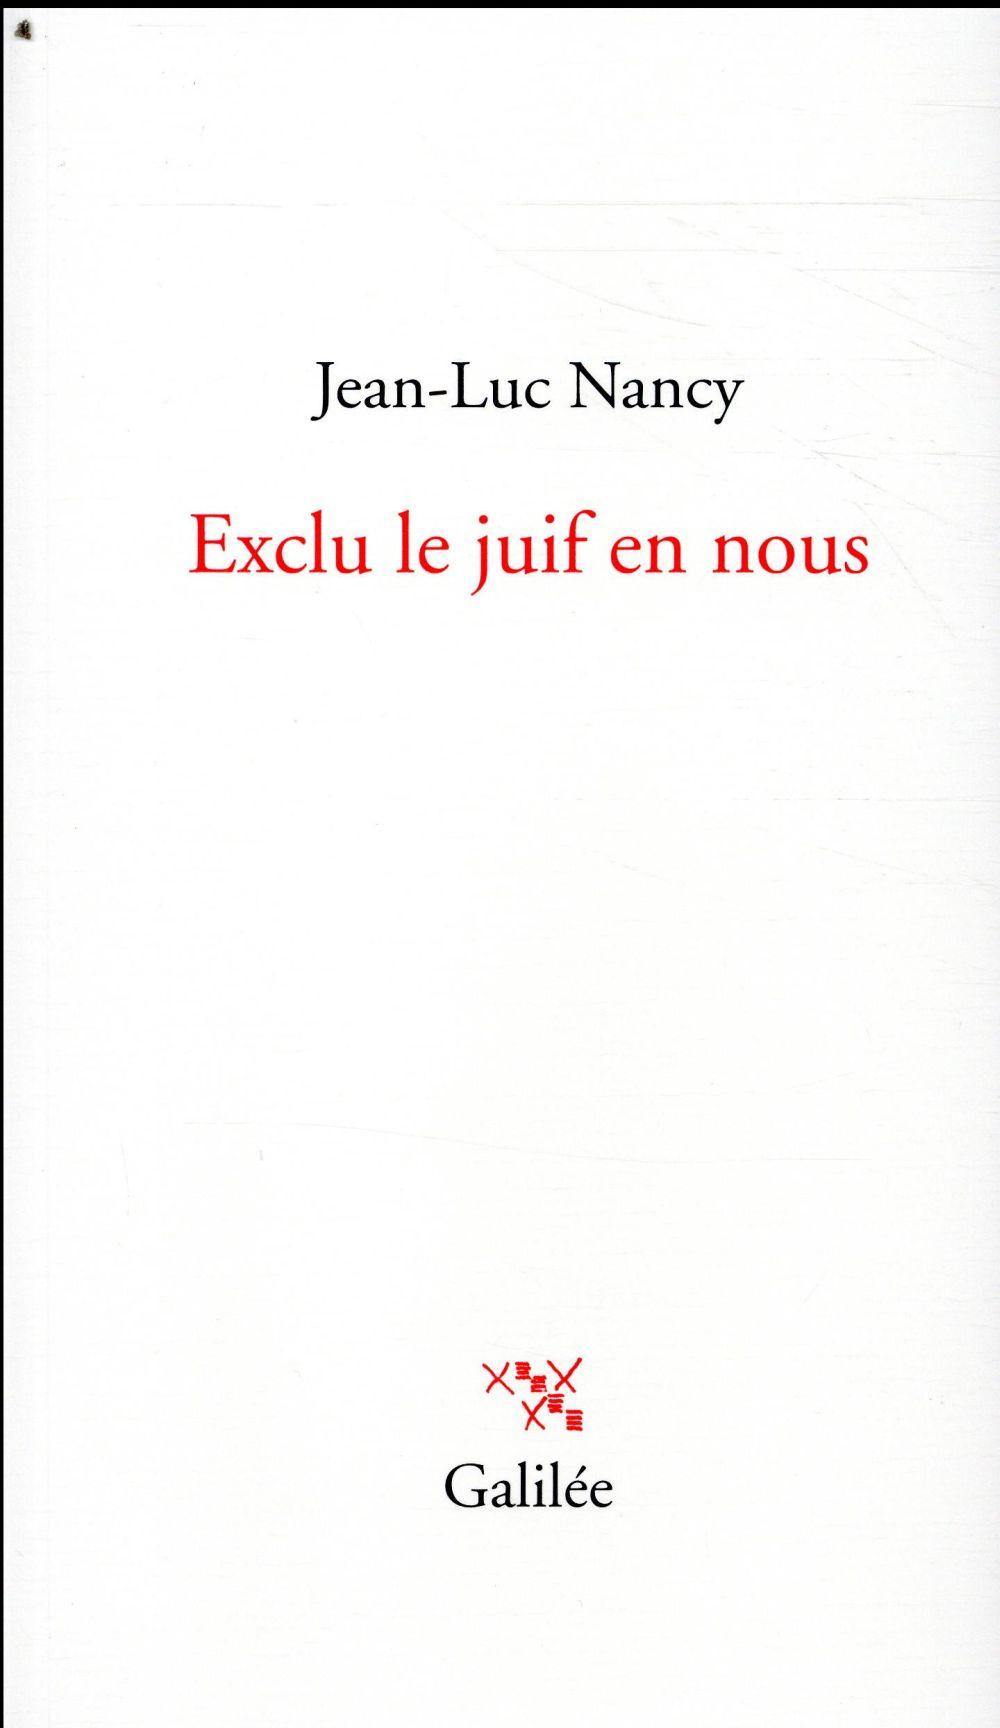 EXCLU LE JUIF EN NOUS